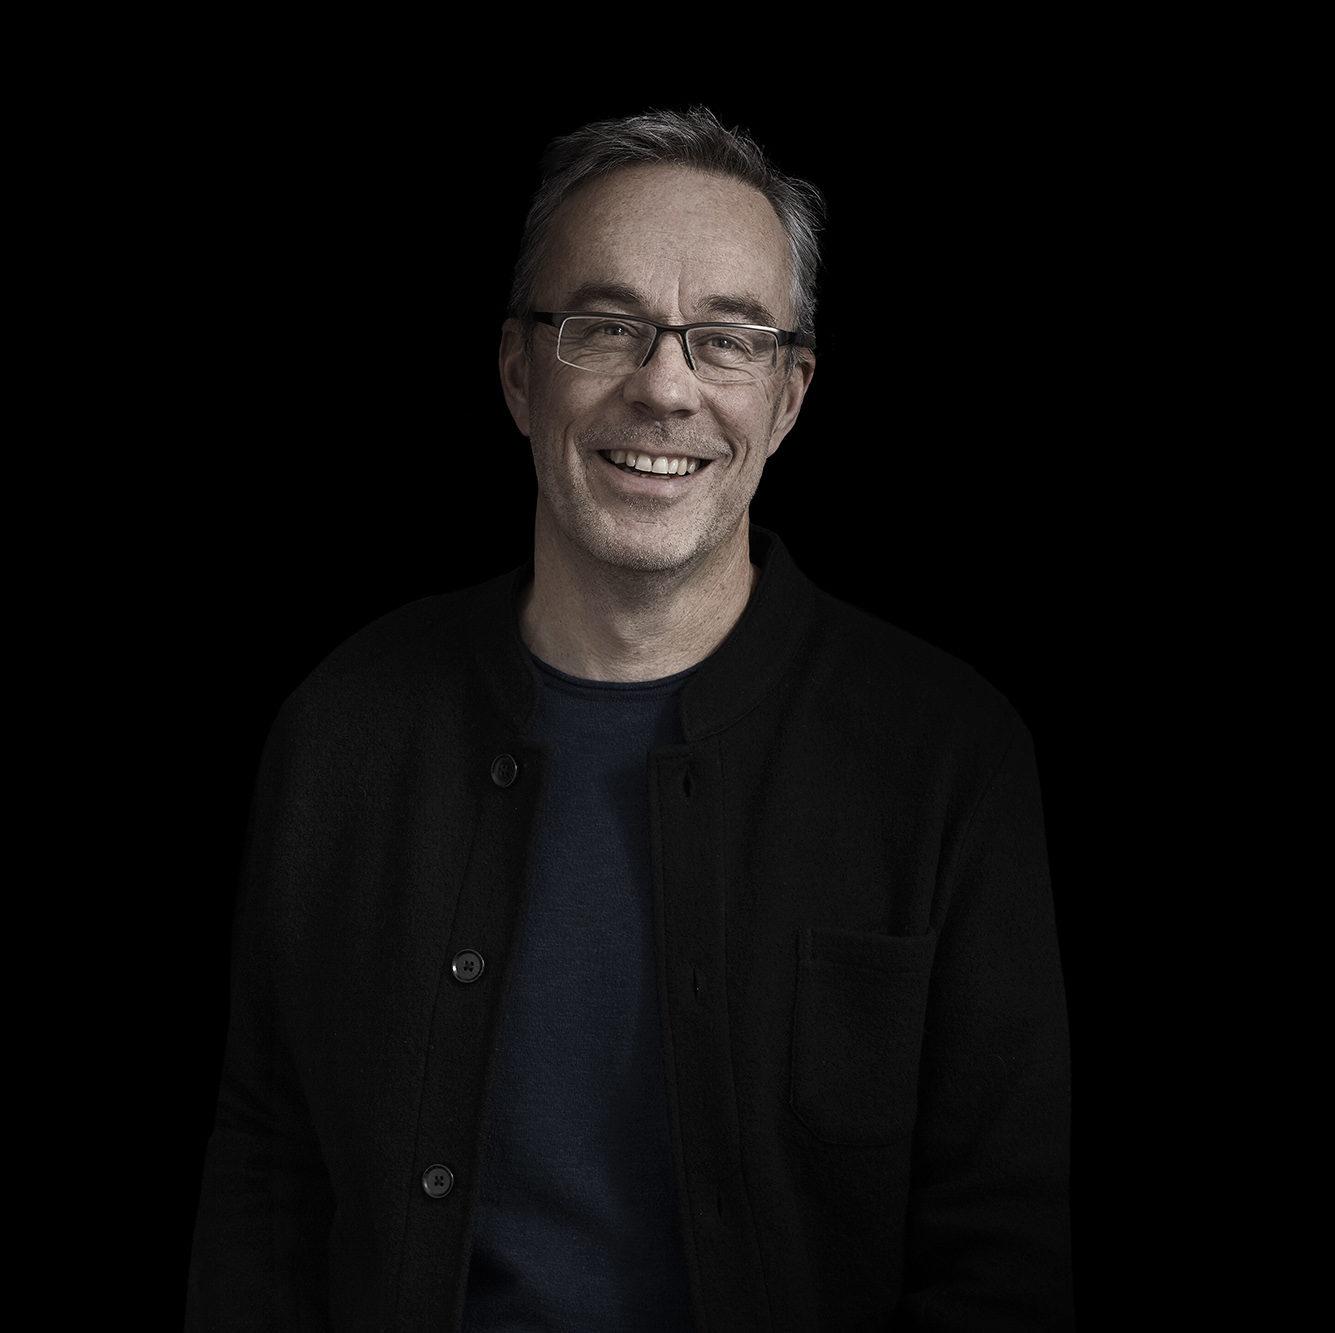 Michael Karpers